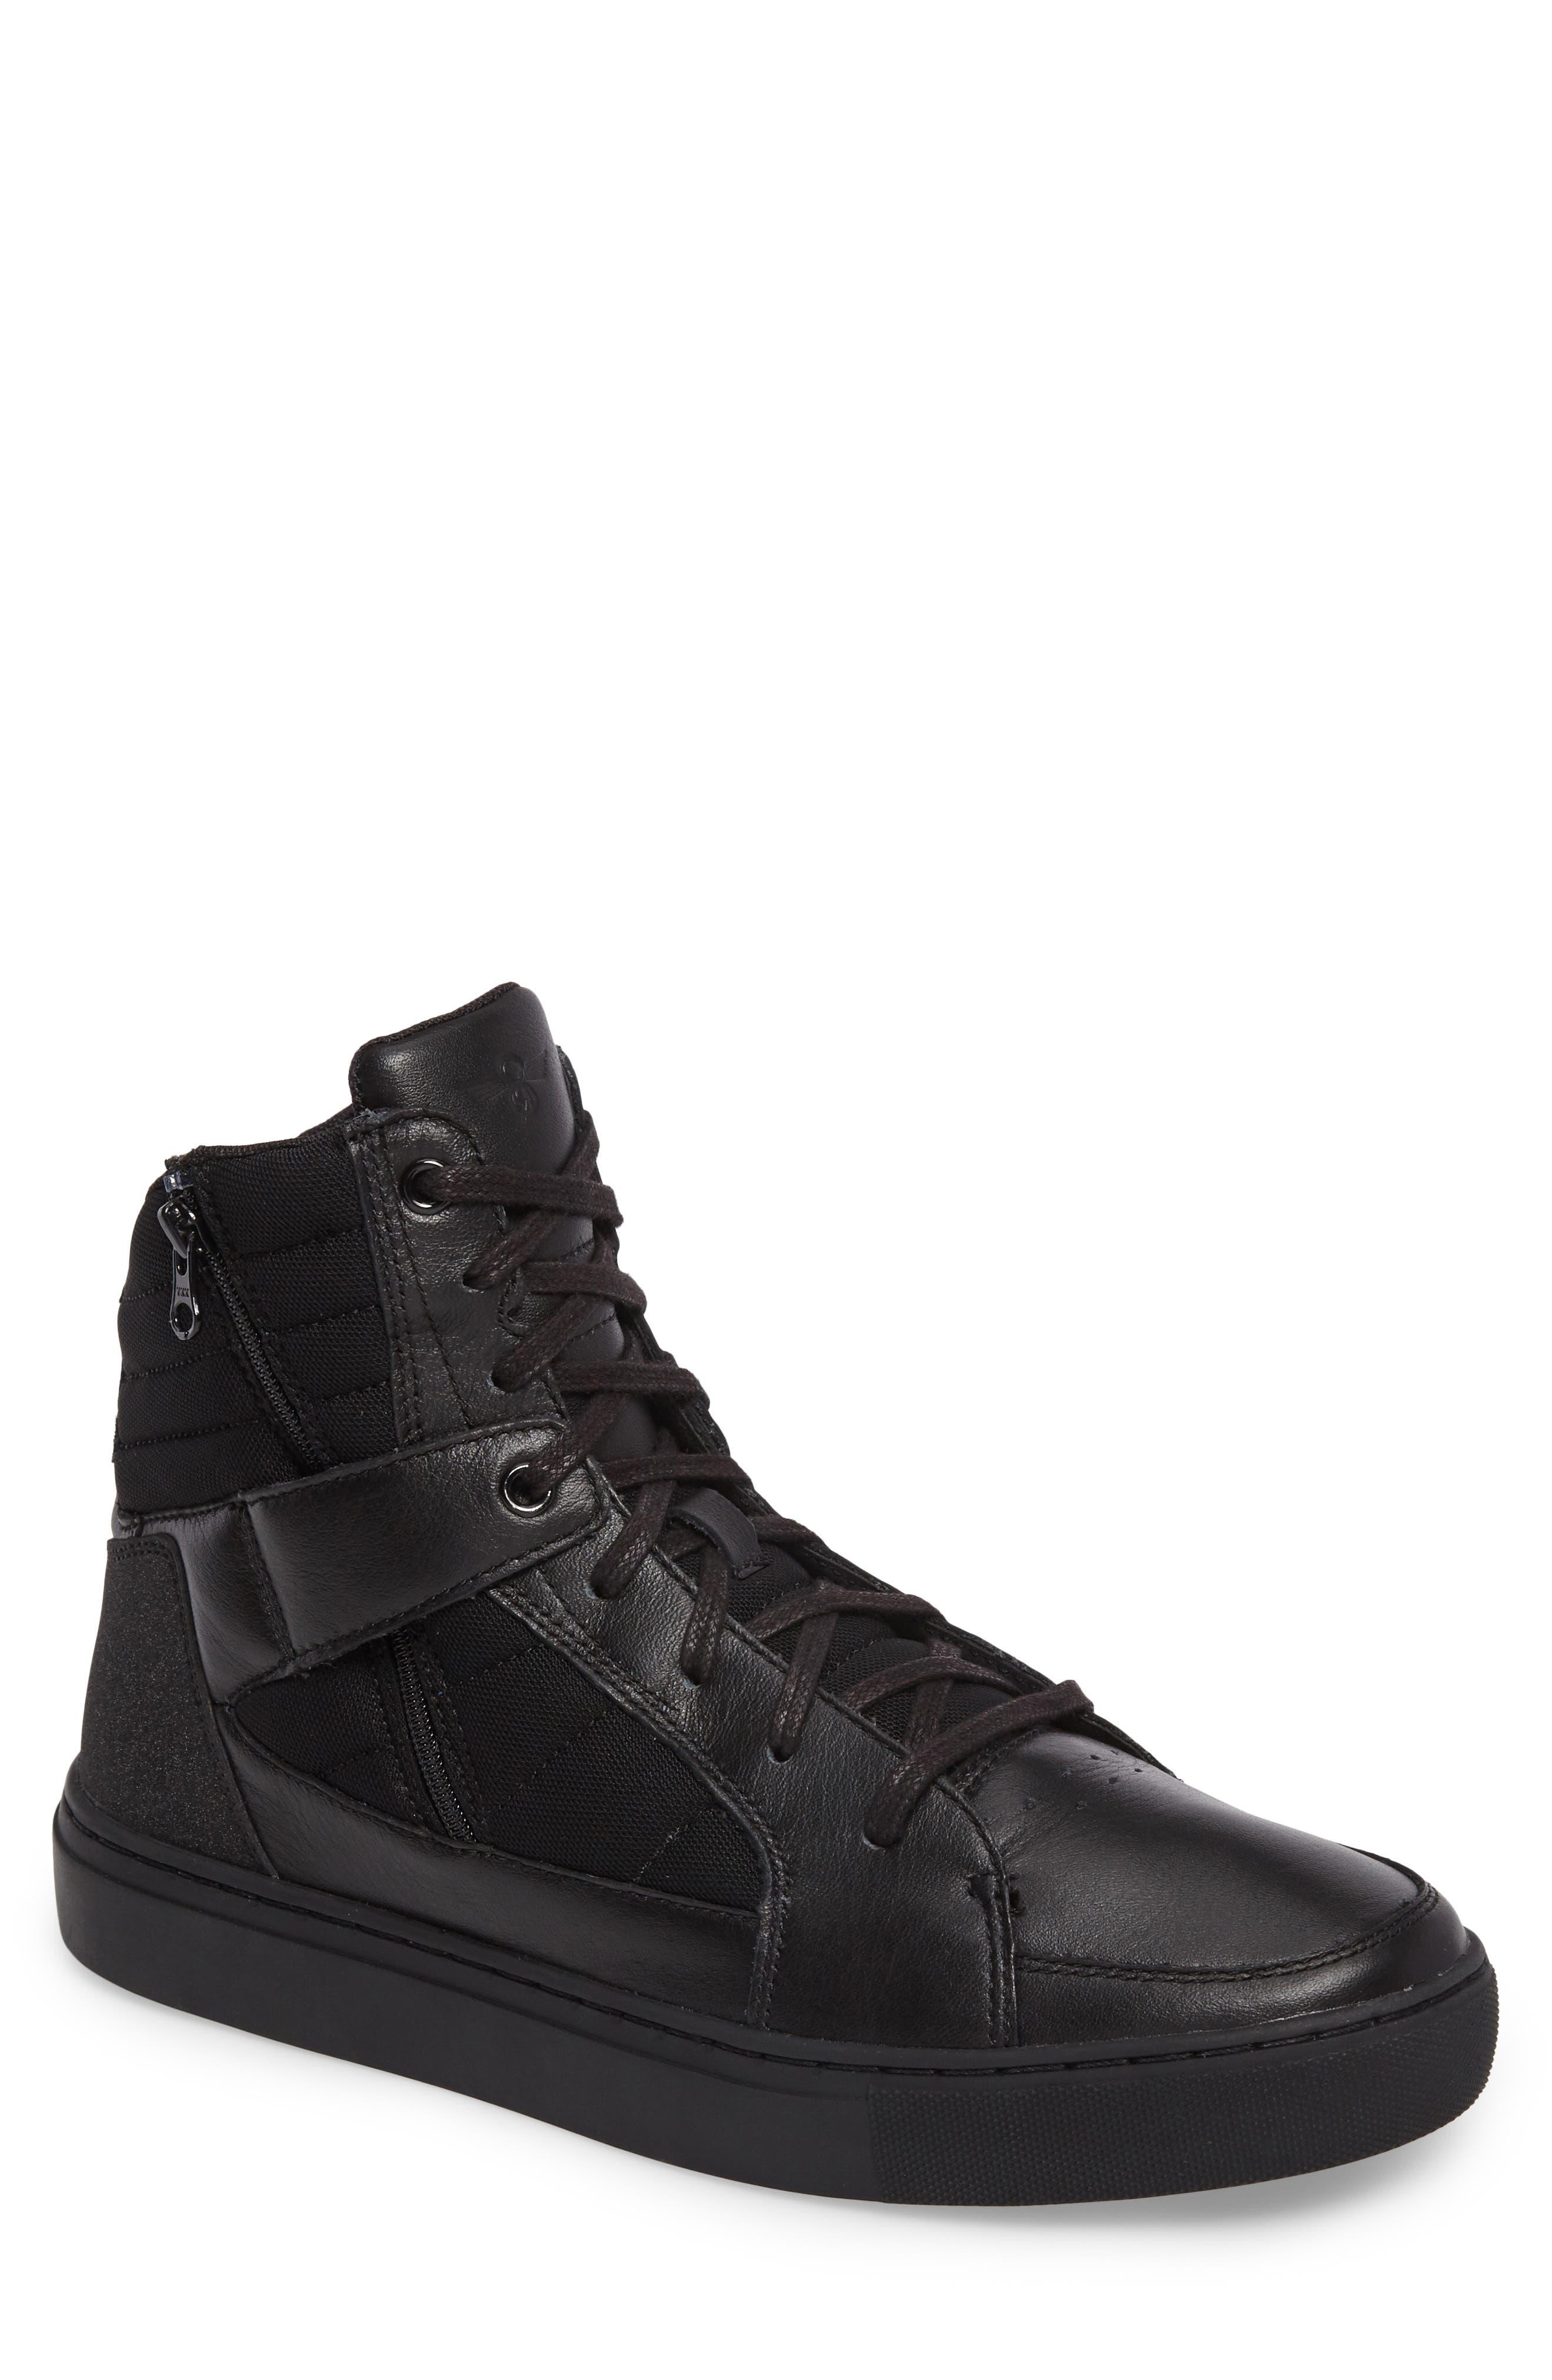 Alternate Image 1 Selected - Creative Recreation Varici Sneaker (Men)